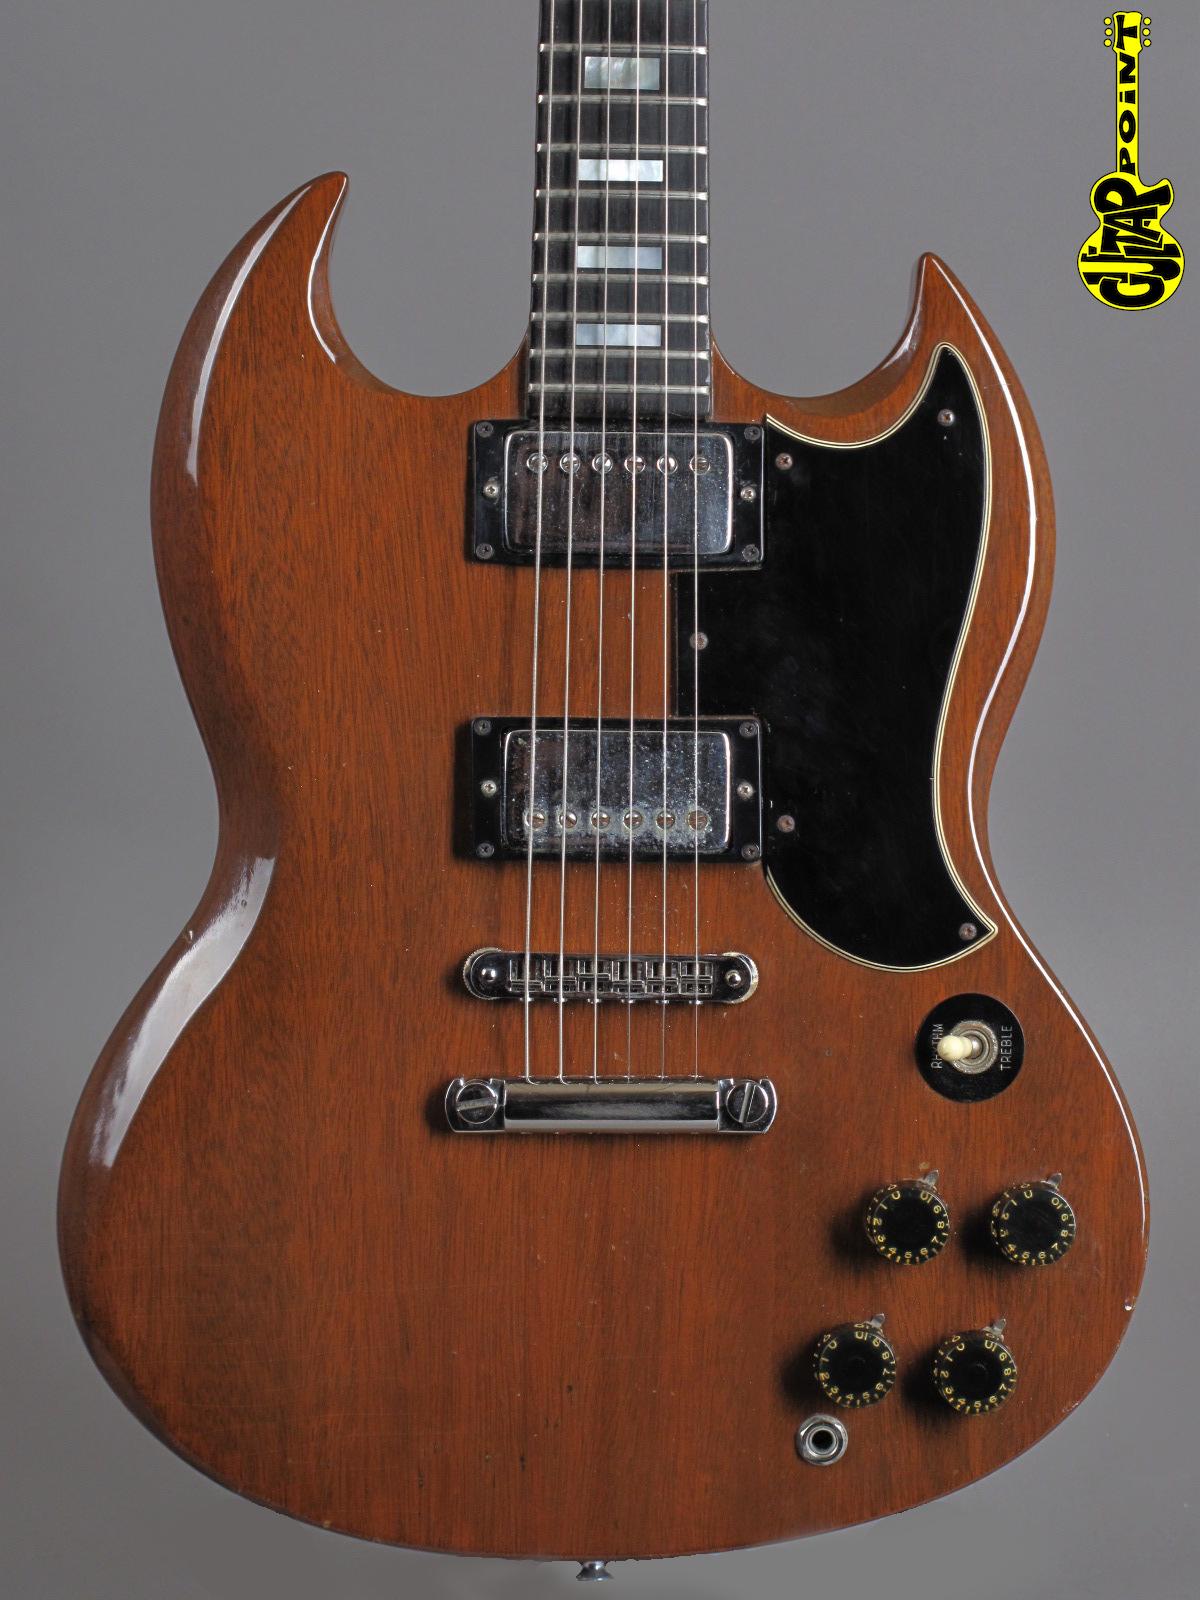 1974 Gibson SG Standard - Walnut